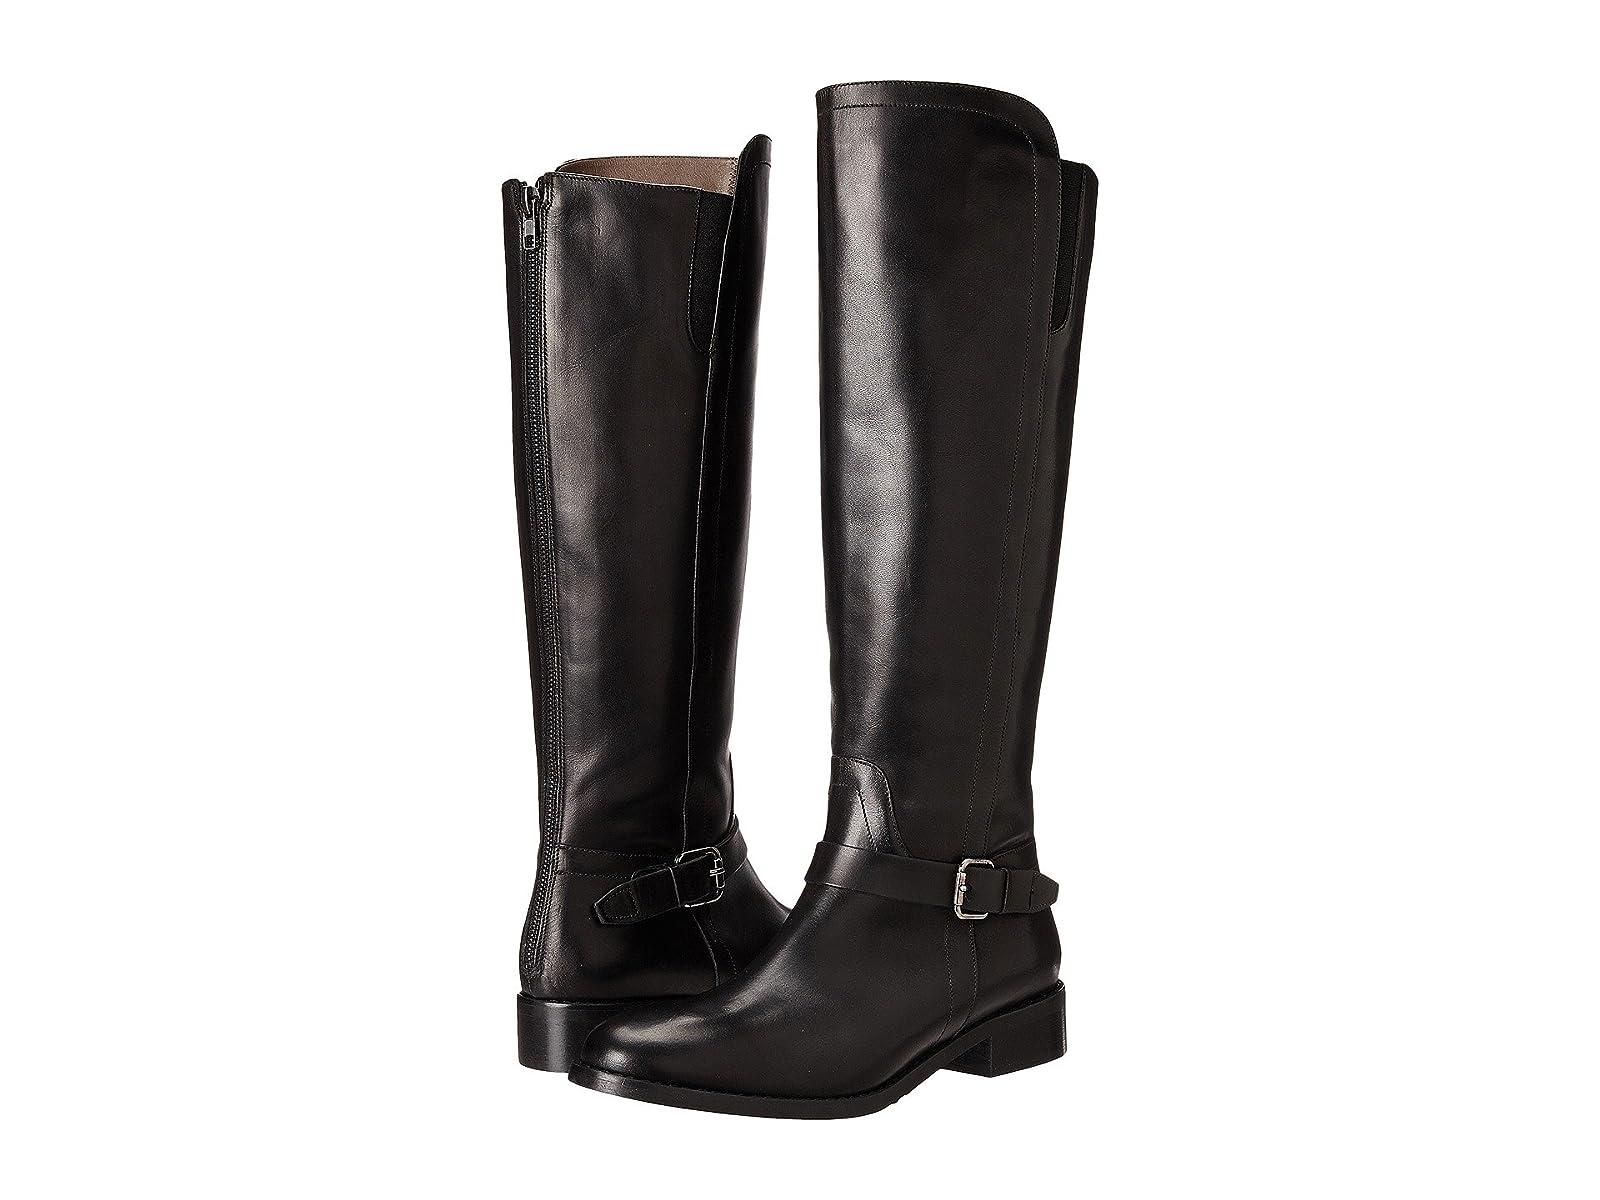 Bella-Vita Esa-ItalyCheap and distinctive eye-catching shoes